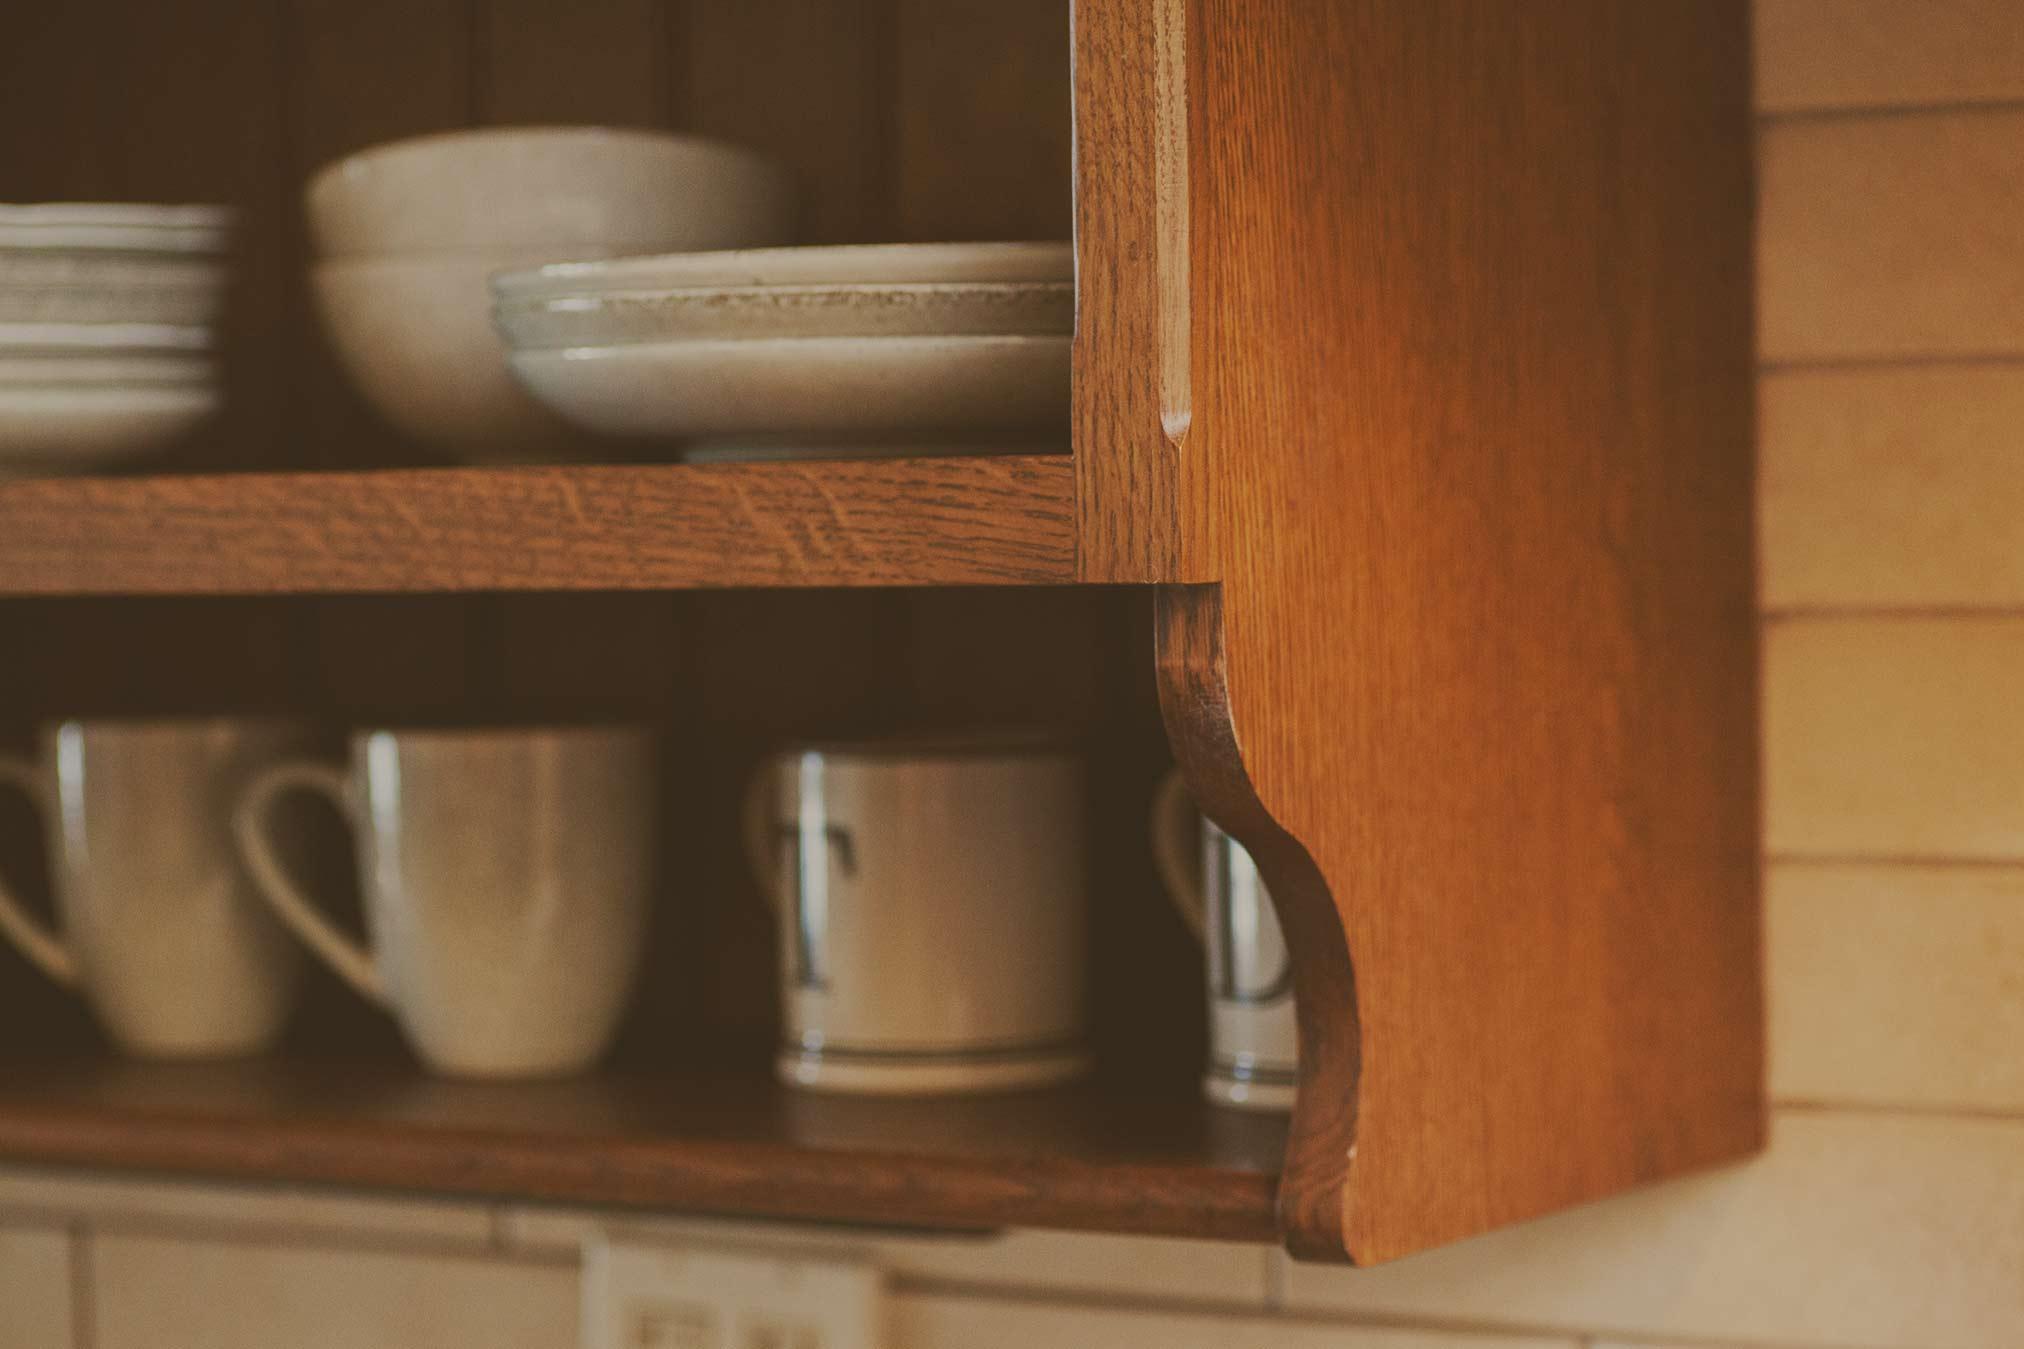 French Creek Cabinetry & Design Portfolio